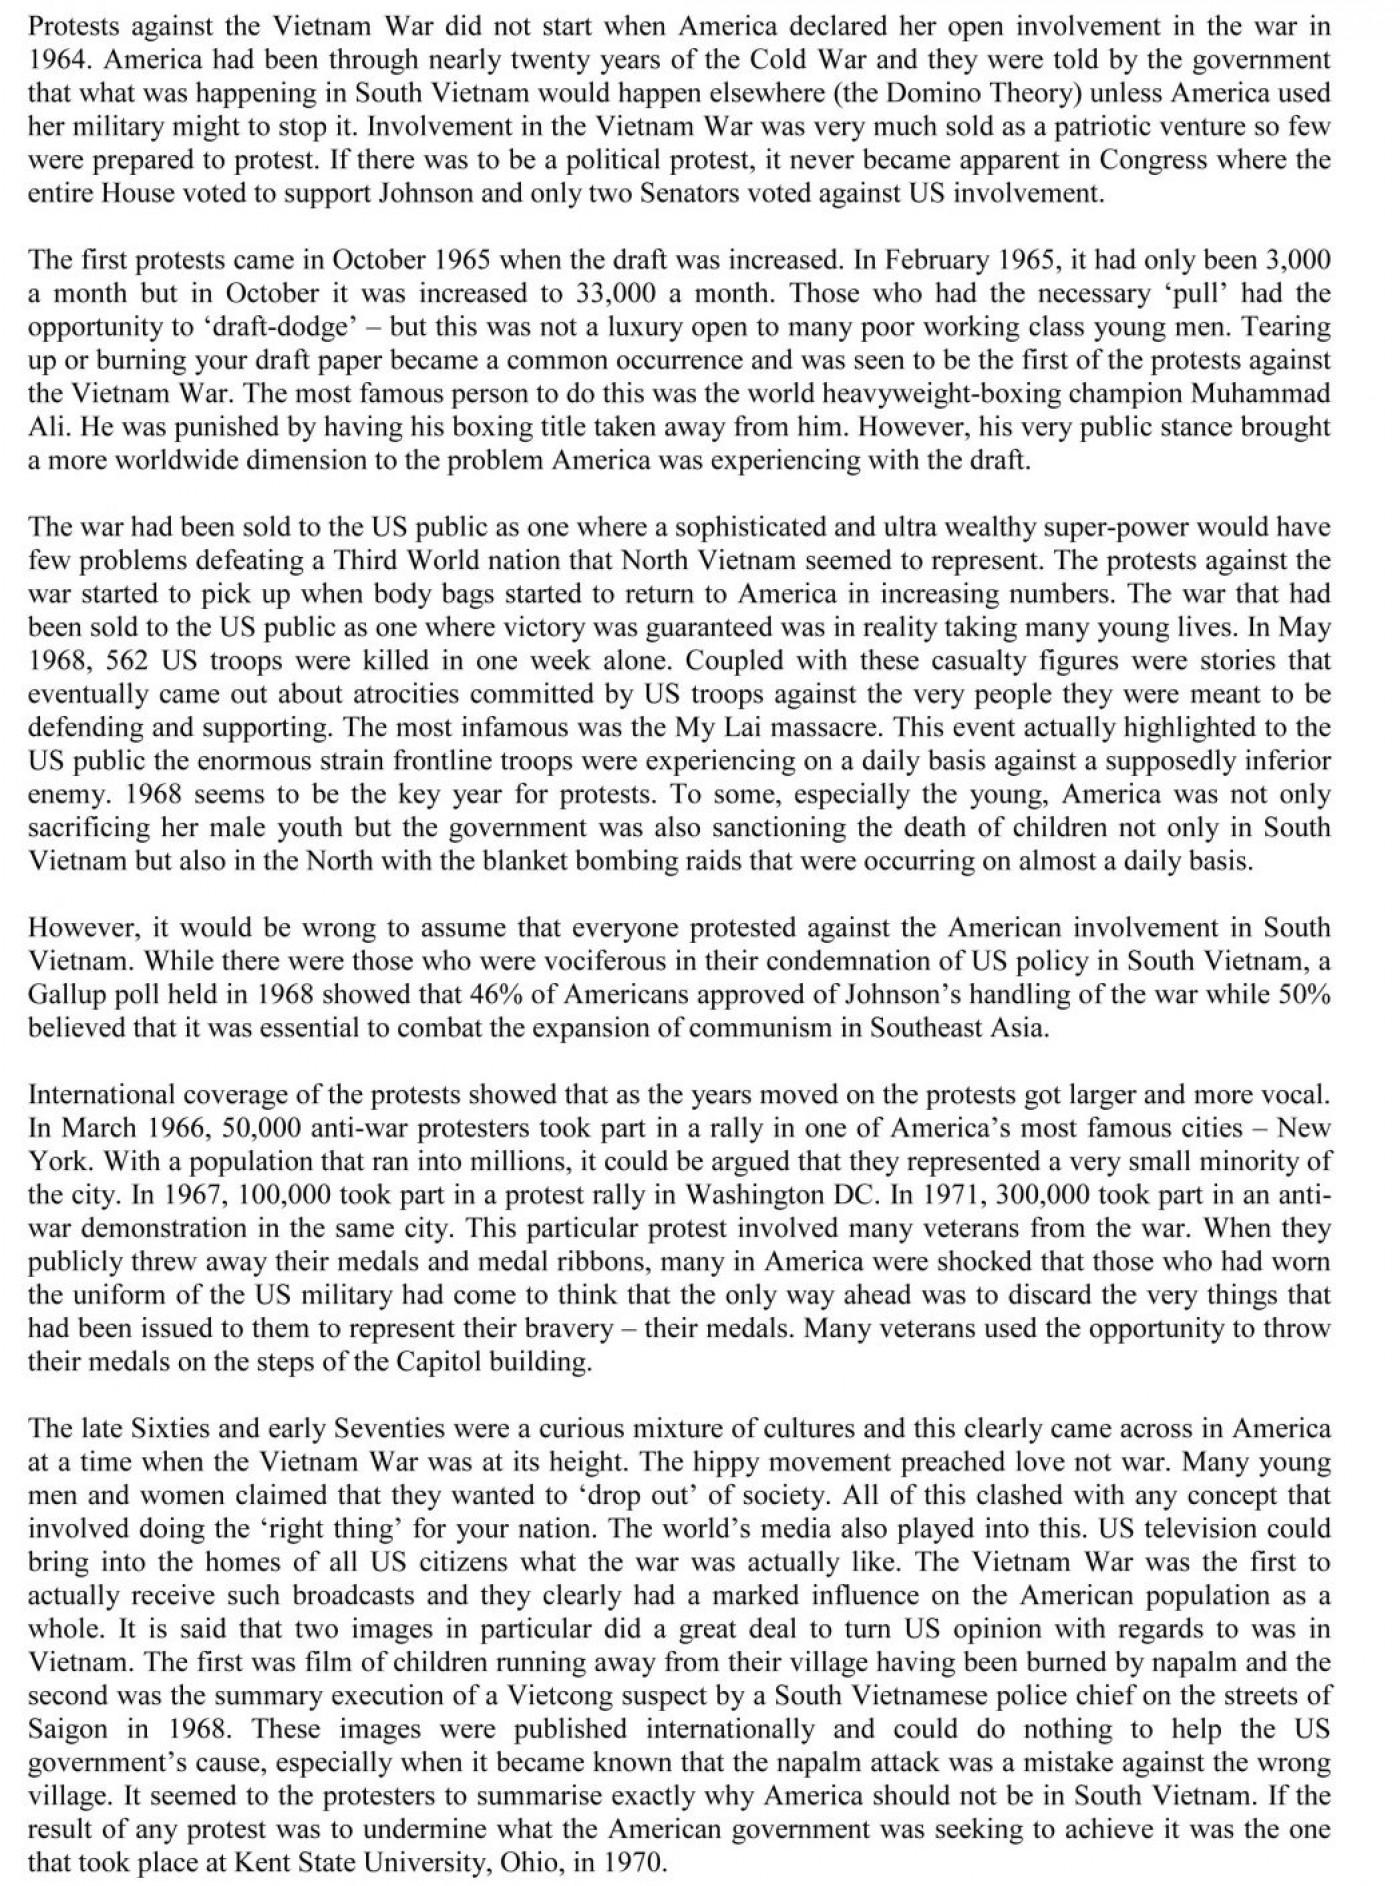 Ethic essay writing